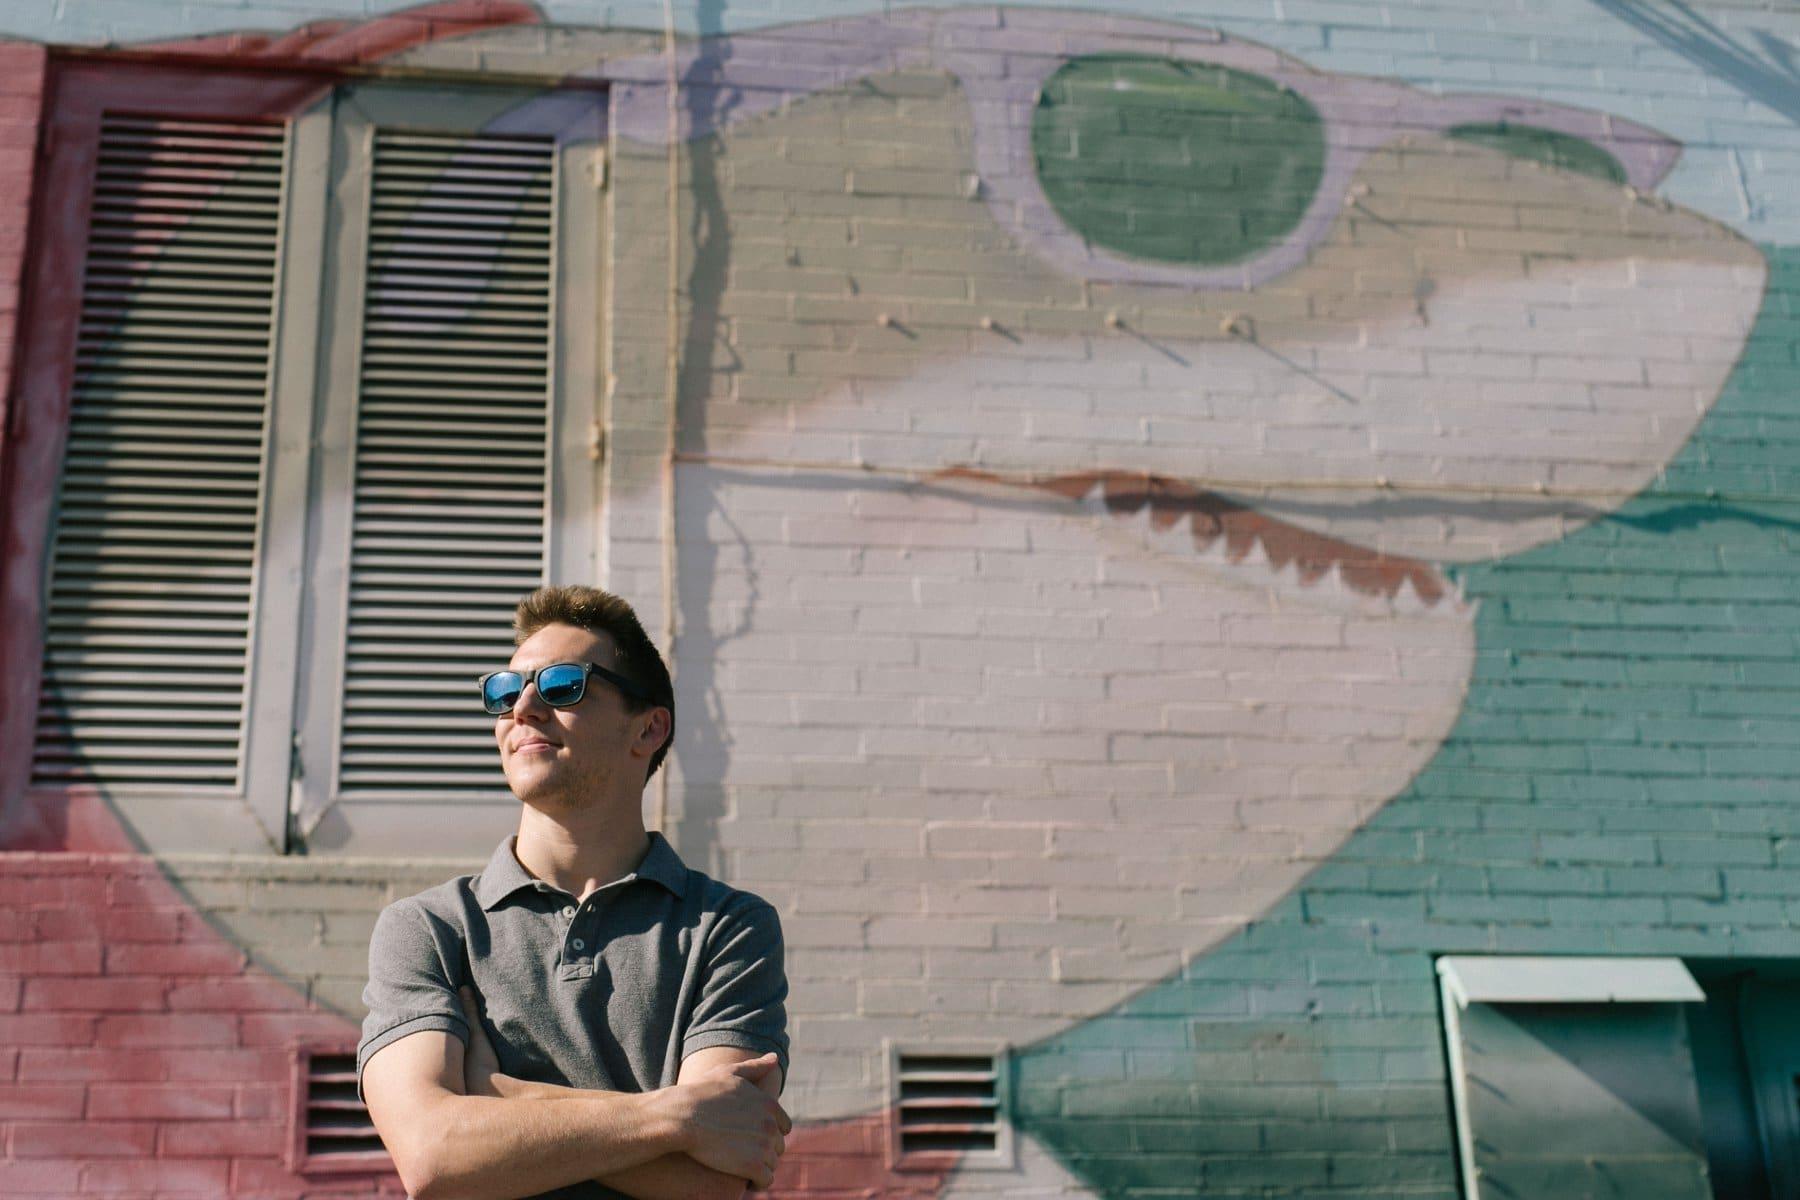 college senior graduate casual photos with sunglasses & a shark mural cool college senior guy photos